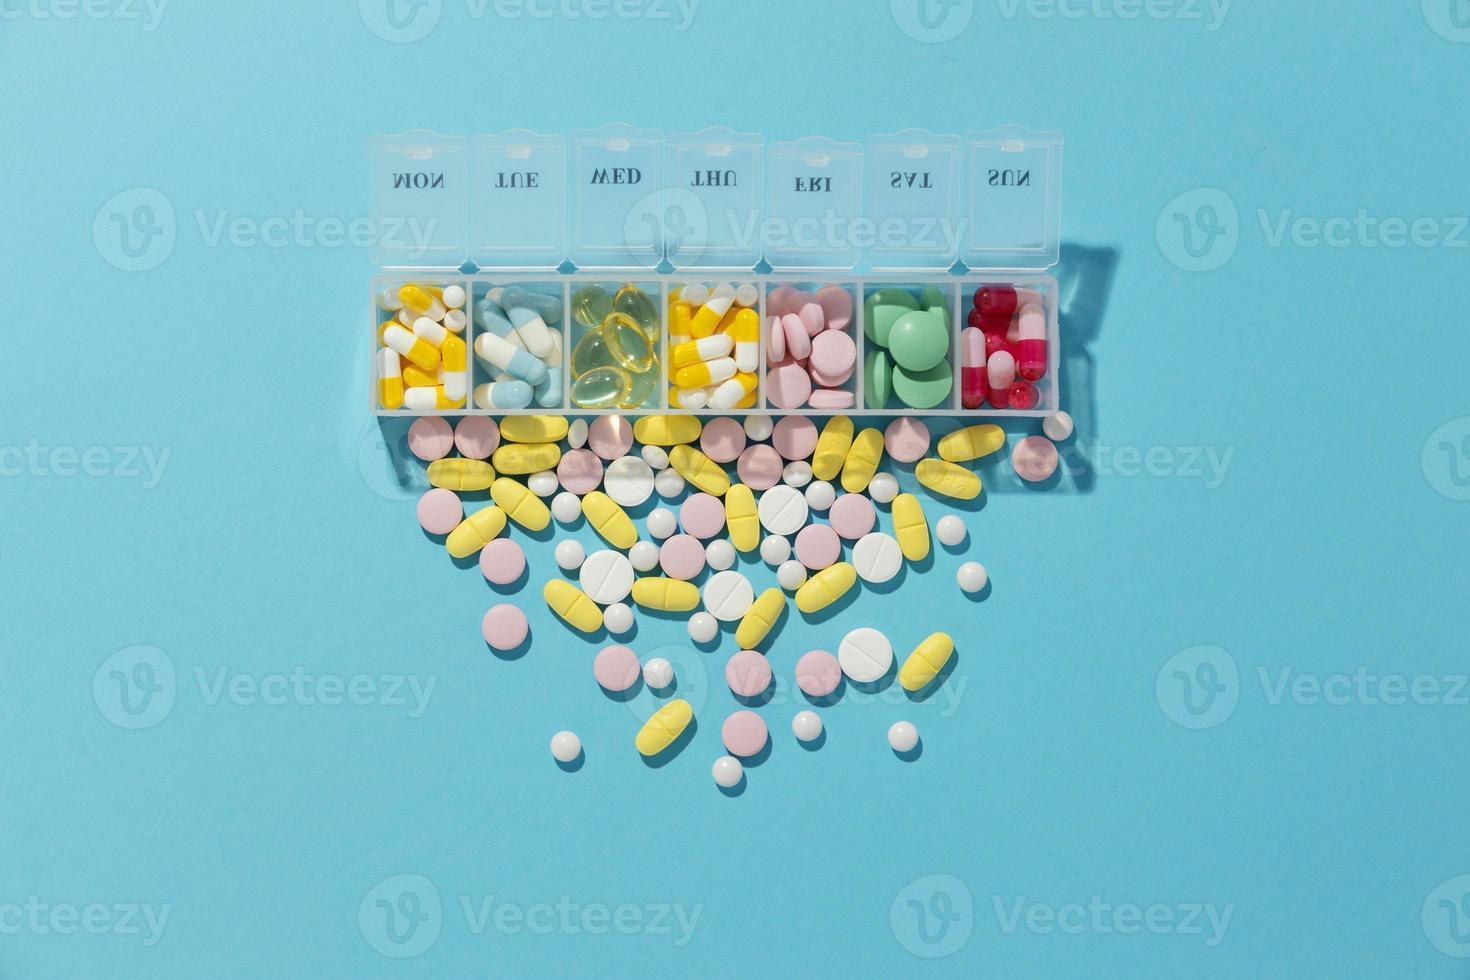 Minimal medicinal pills assortment. Resolution and high quality beautiful photo